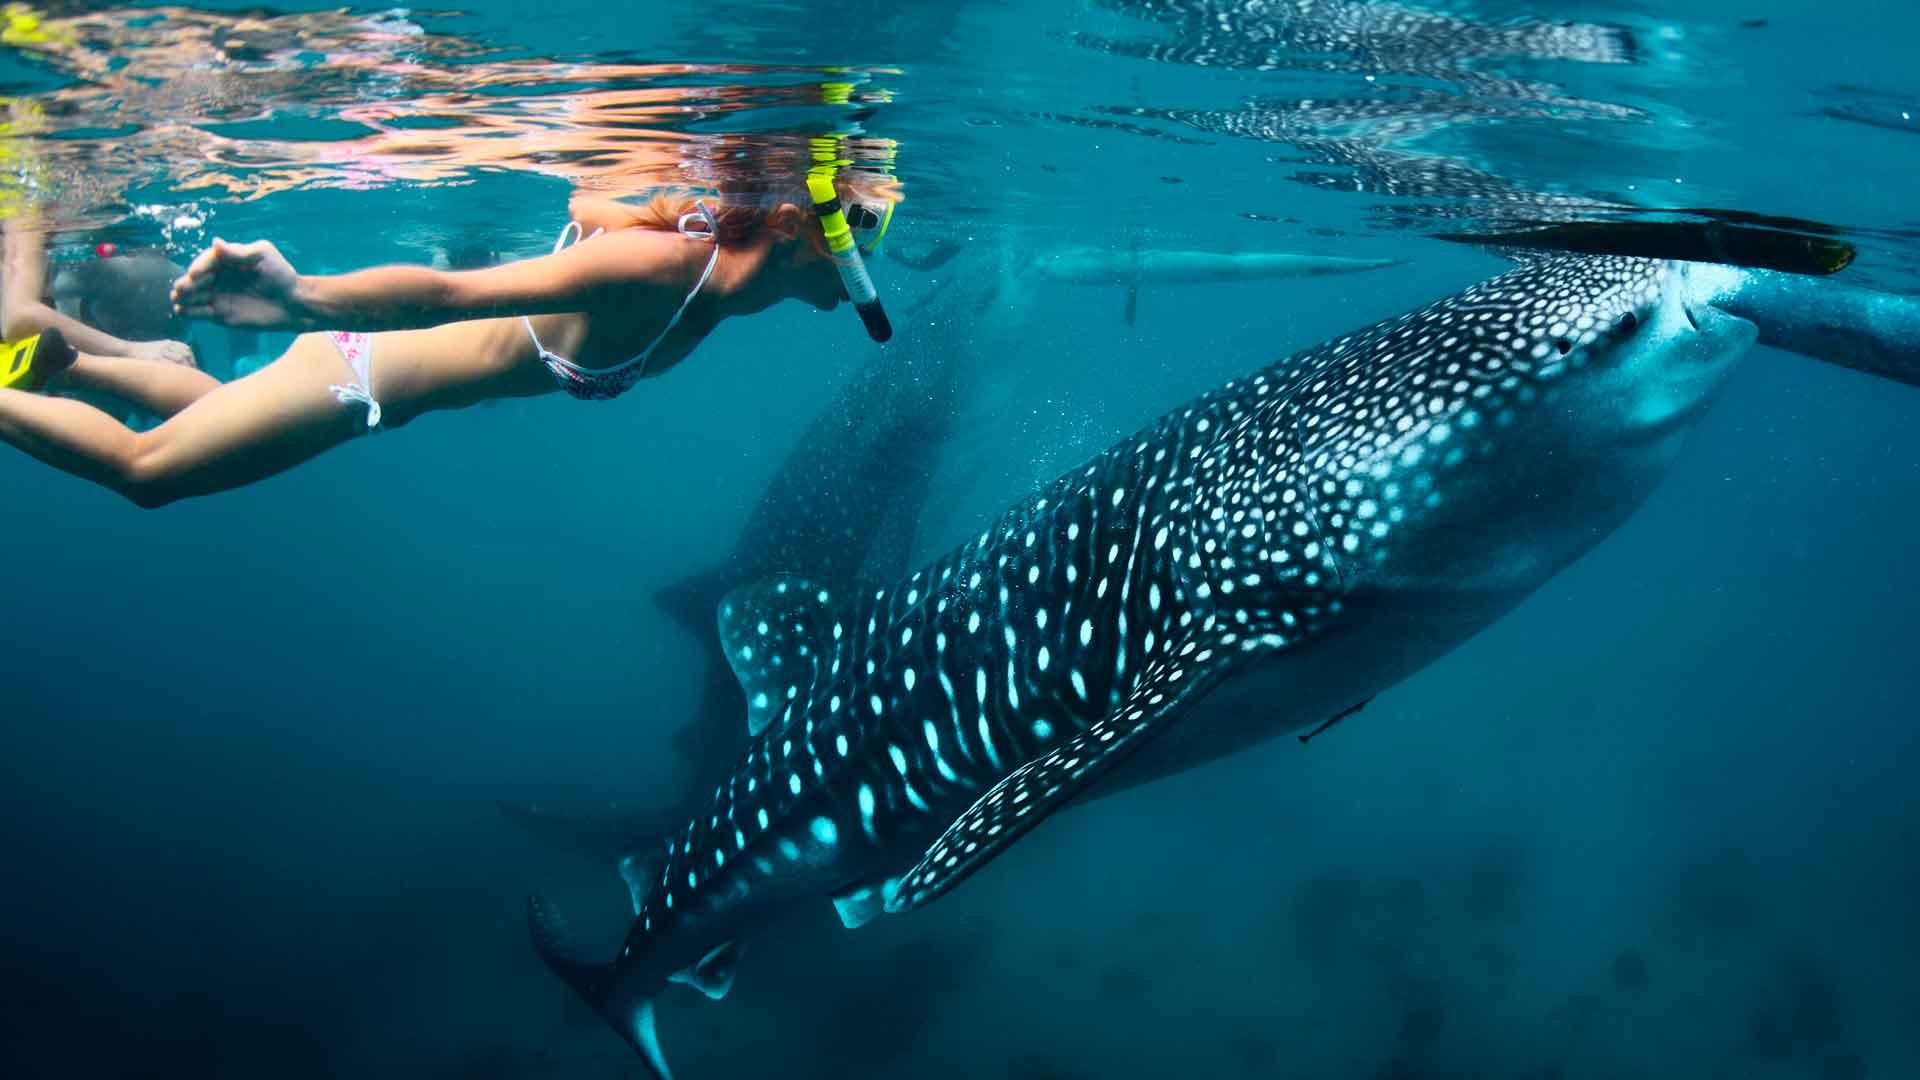 Tiburón ballena en México, regalo de la naturaleza